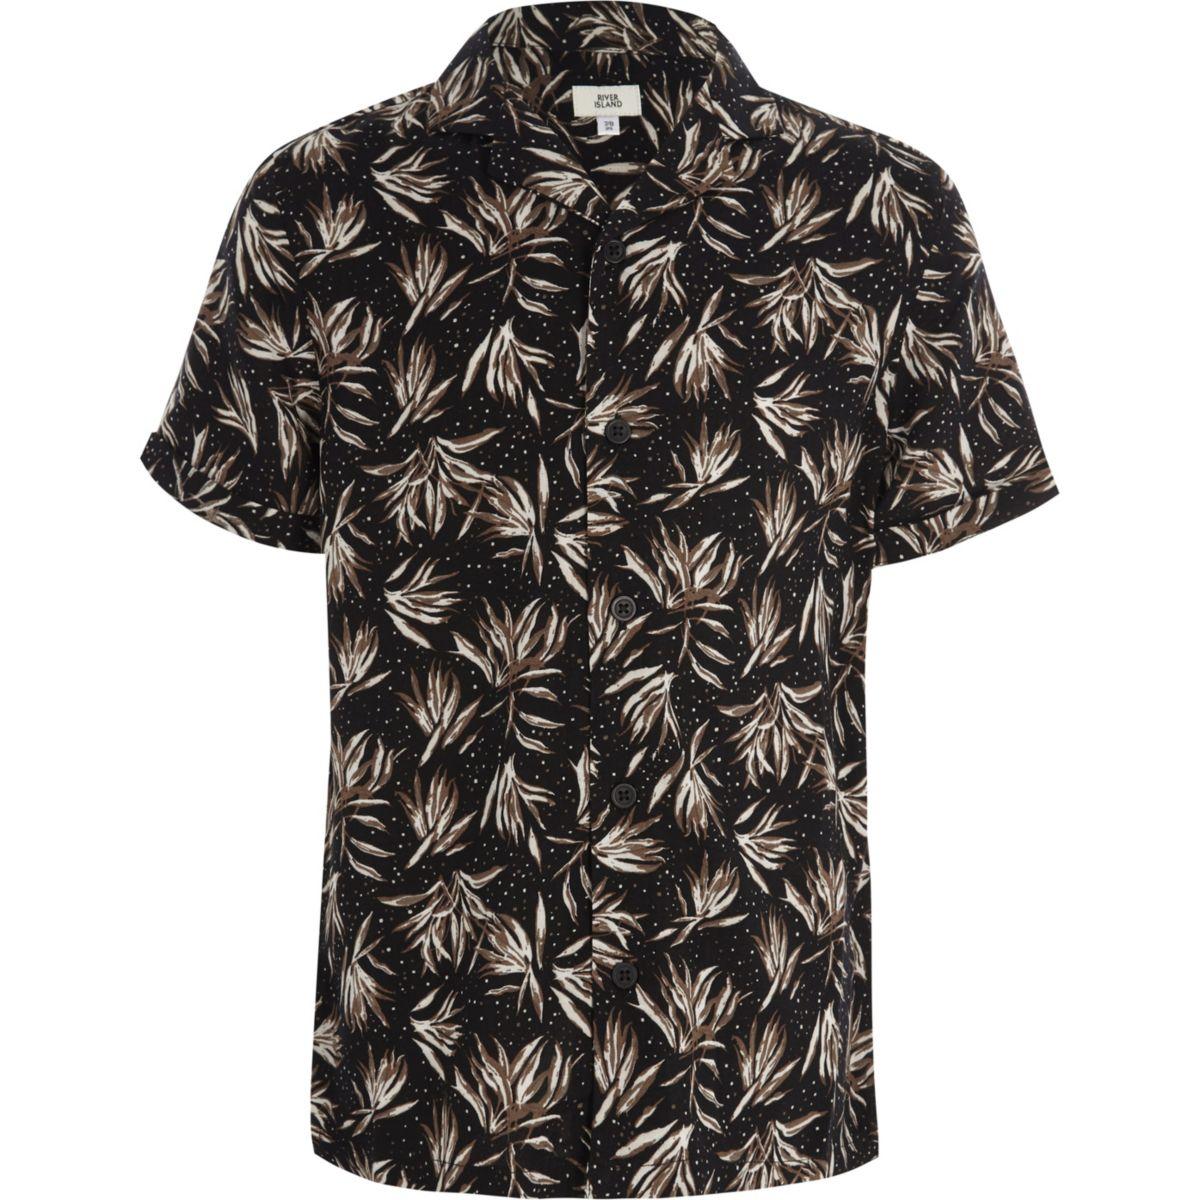 Boys black feather print short sleeve shirt